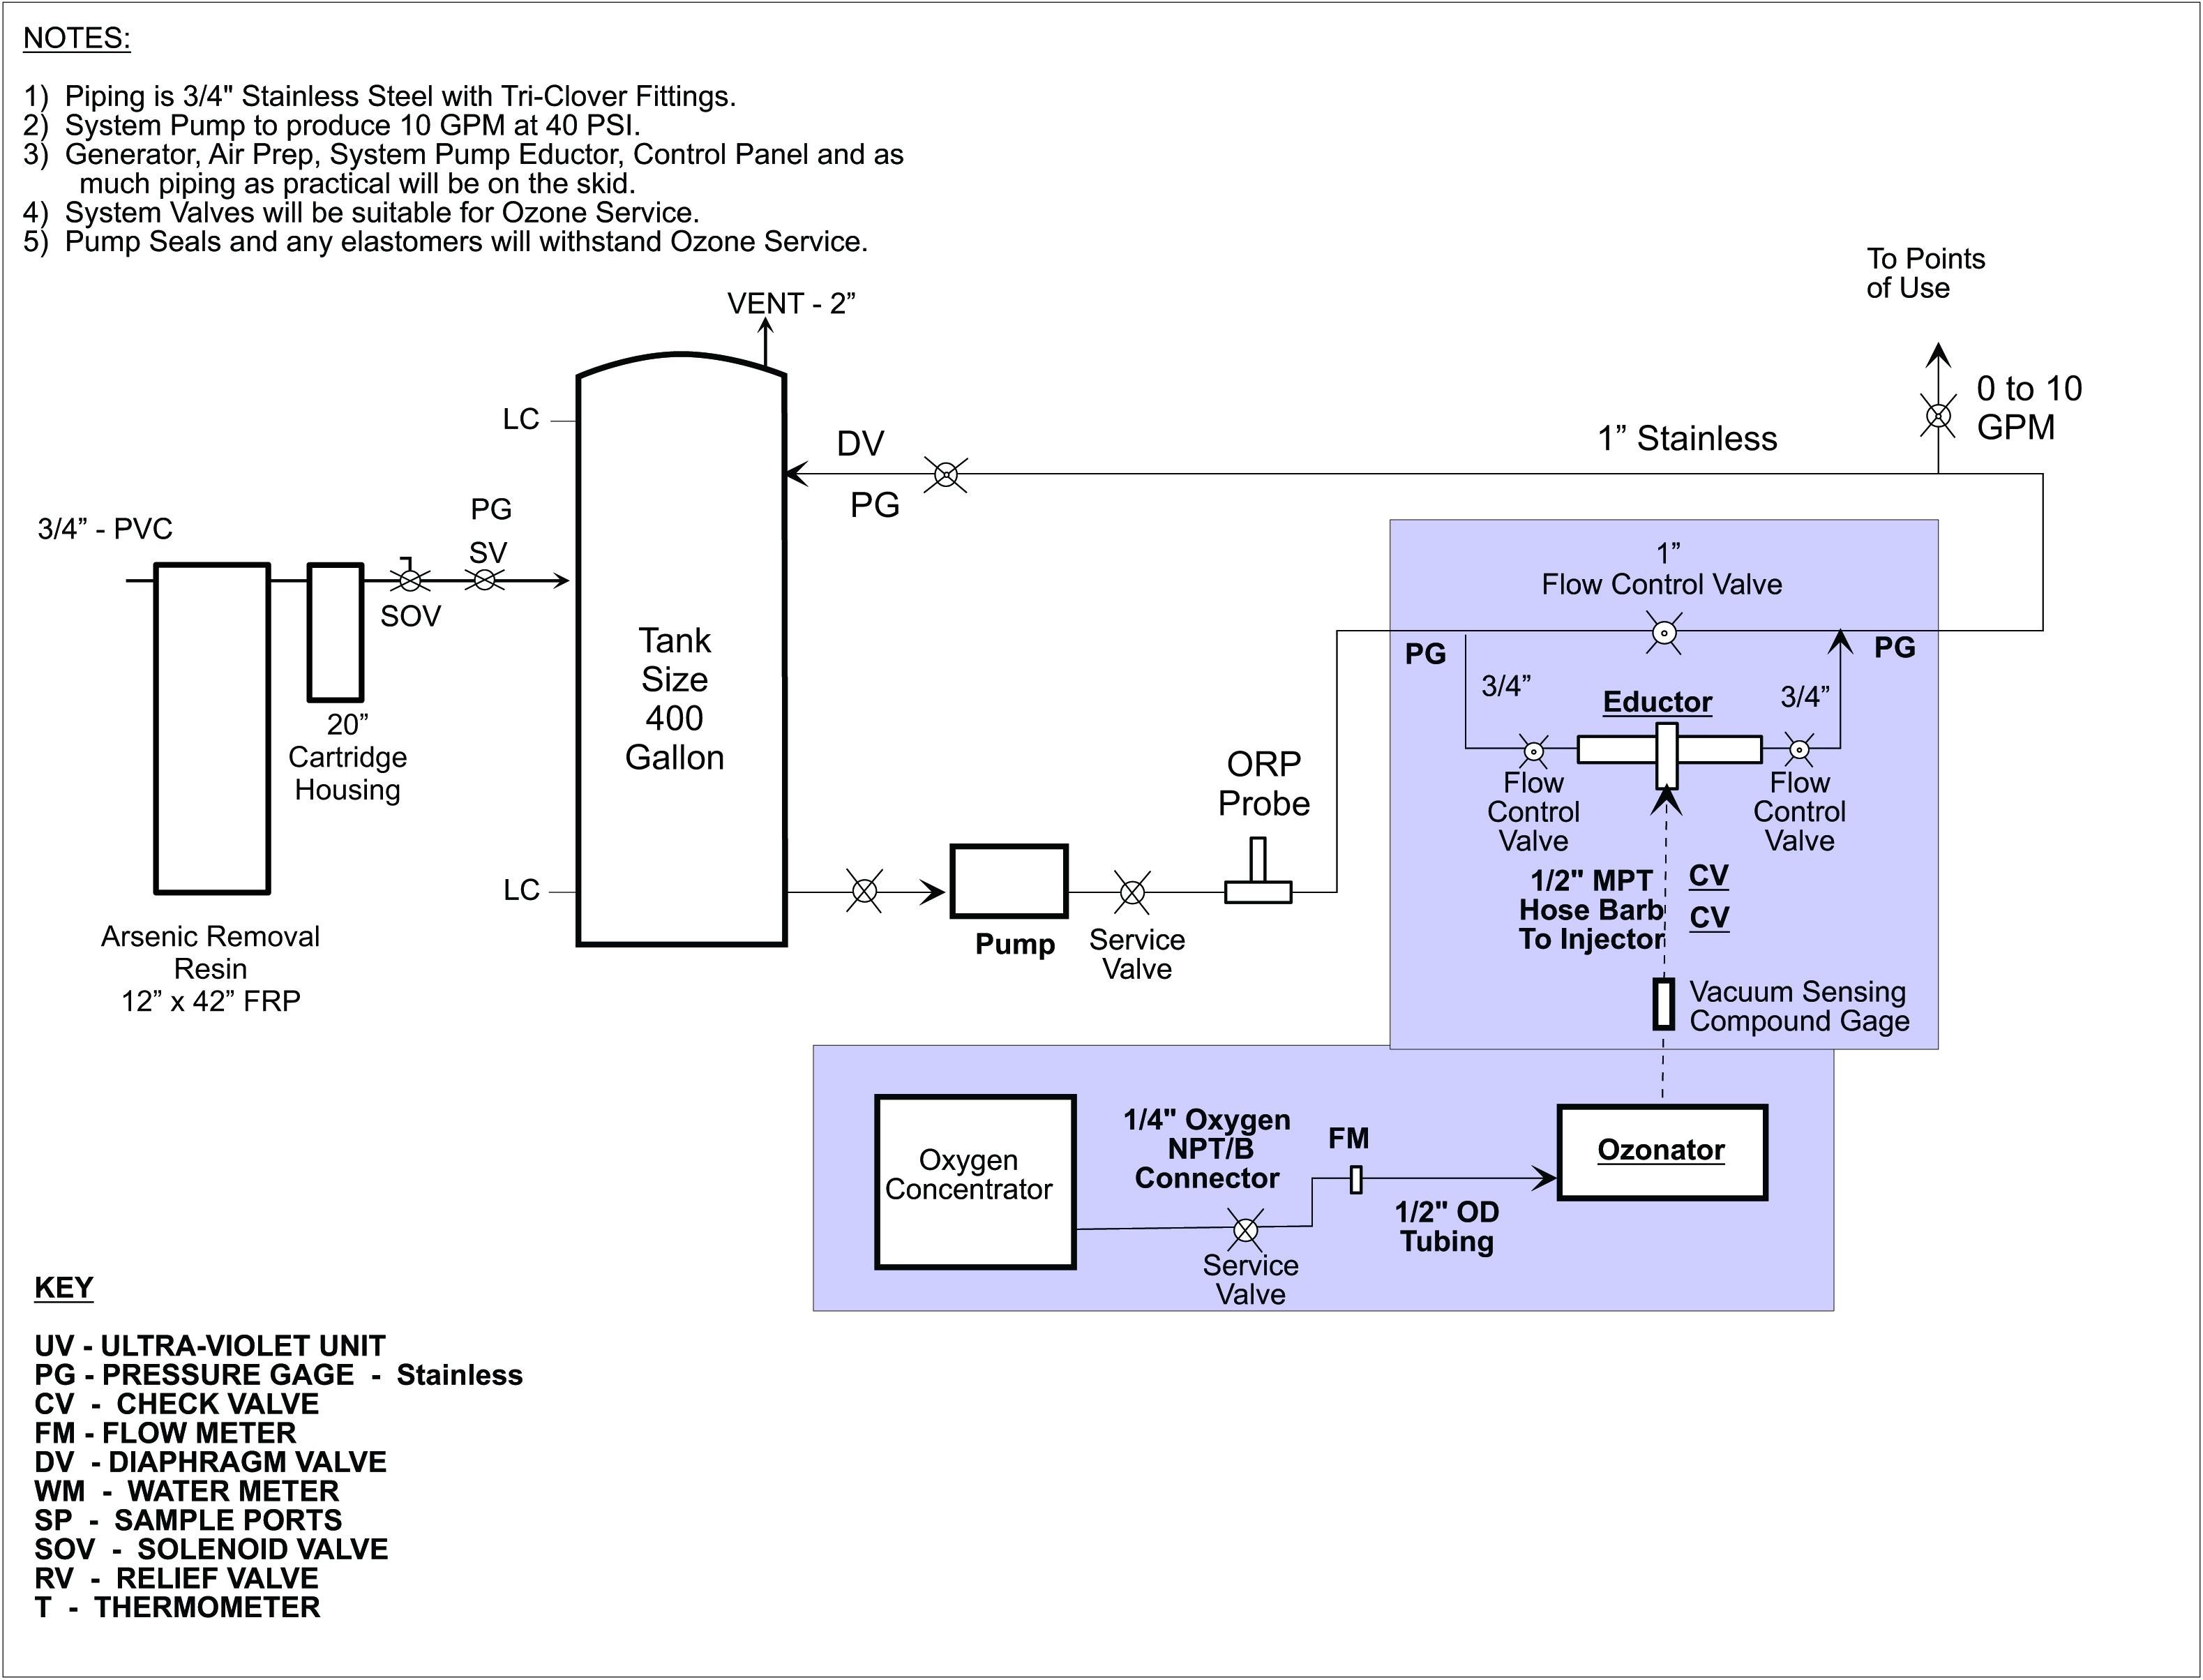 logic probe circuit diagram darlington logic probe circuit diagram tradeoficcom wire data schema e280a2 png